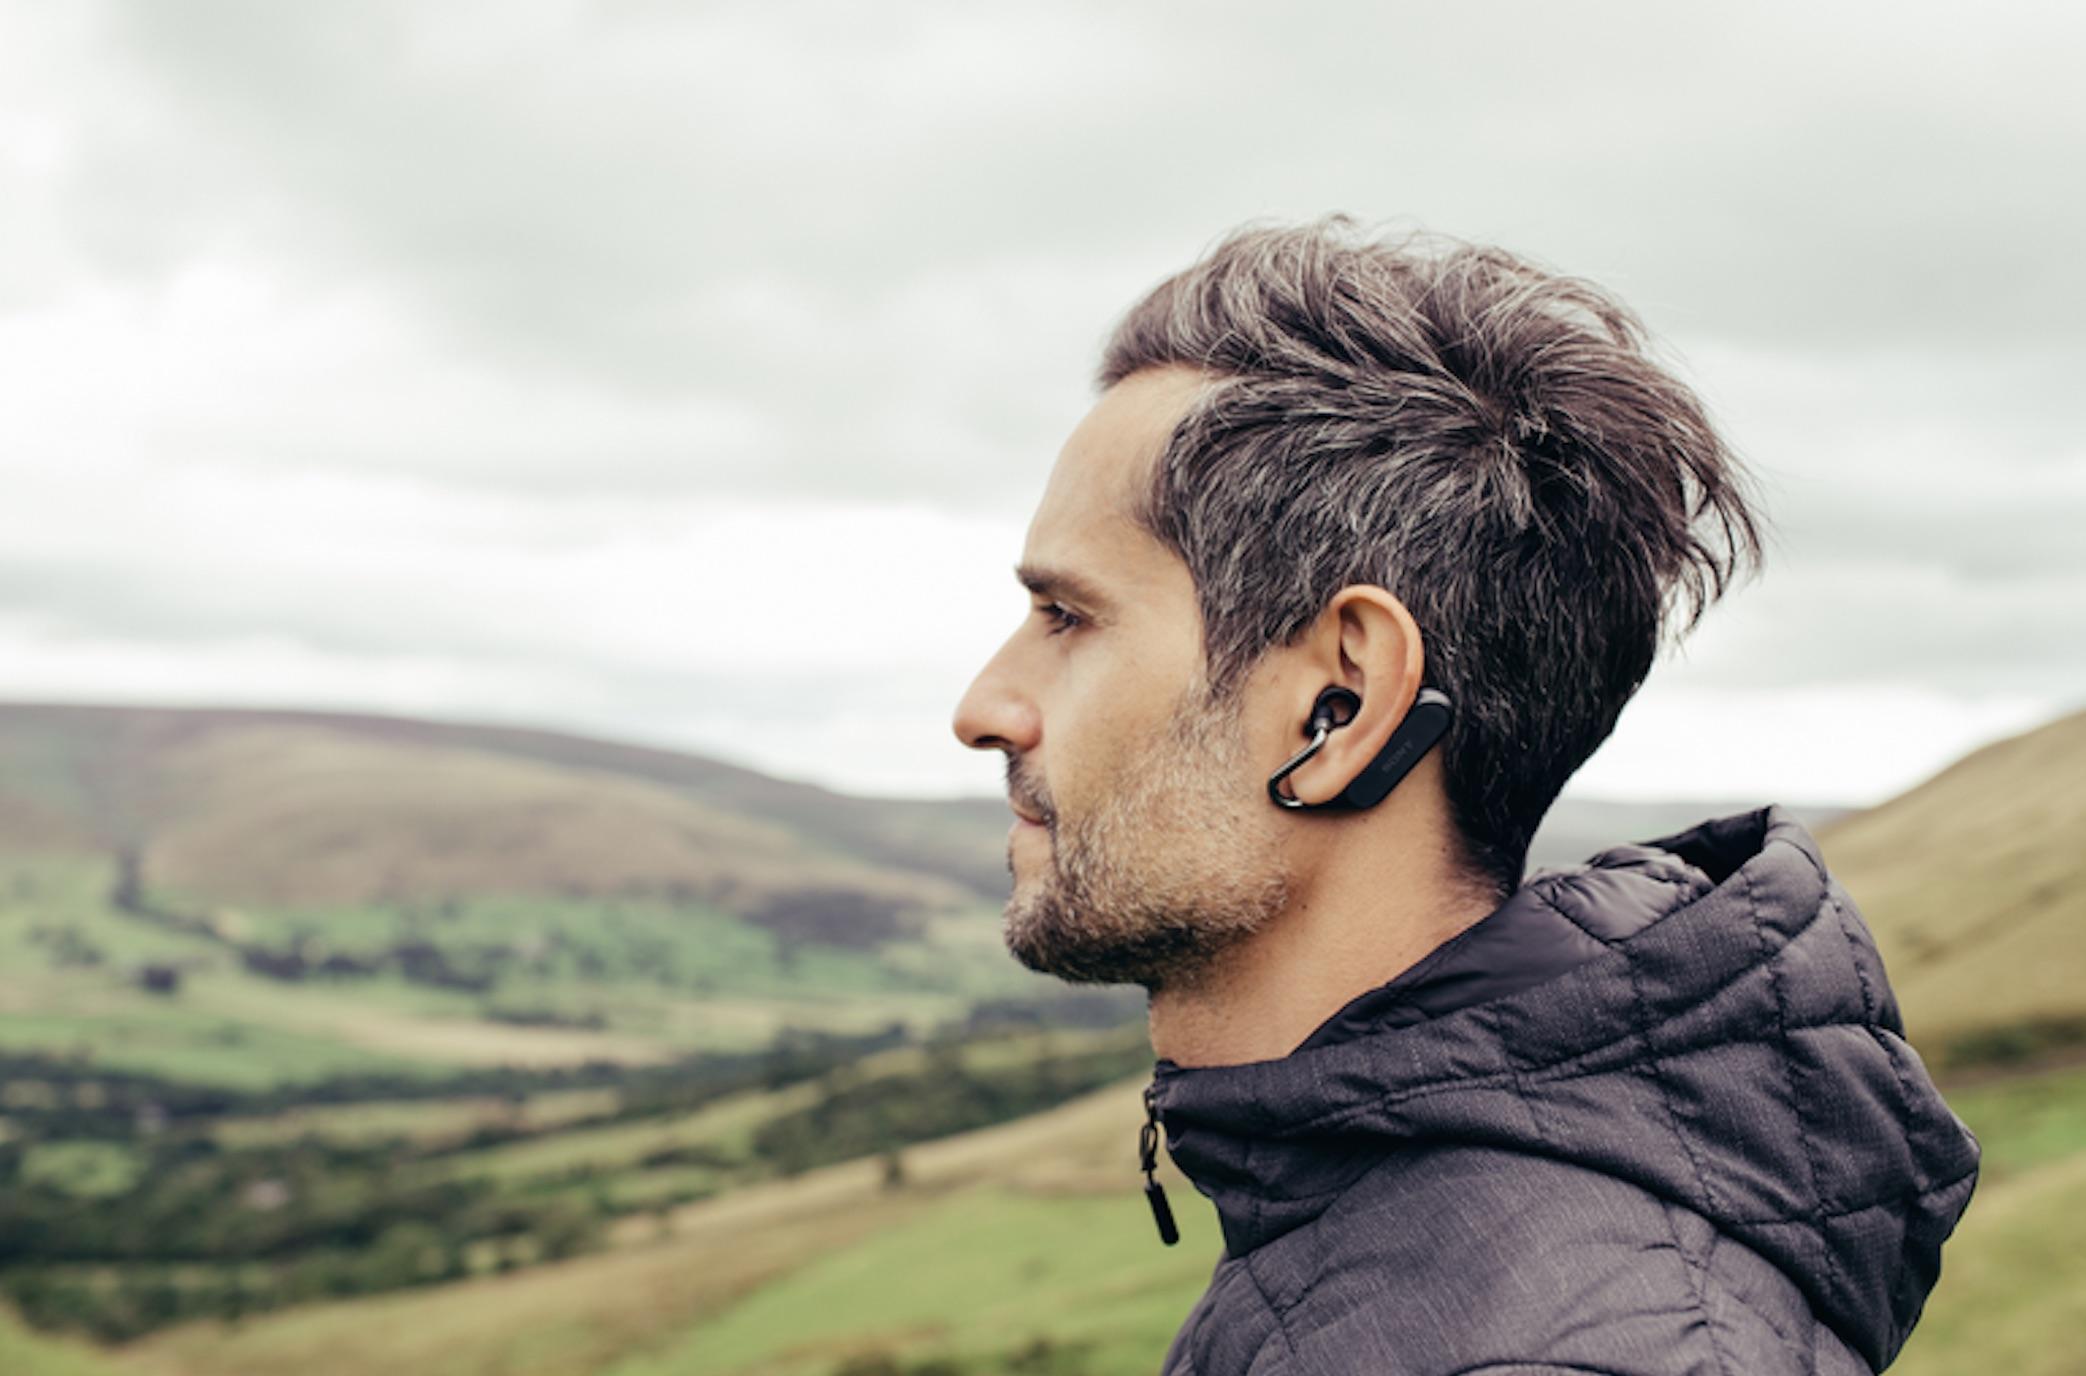 ntelligenten Assistenzfunktionen erleichtert das Xperia Ear Duo zudem den Alltag